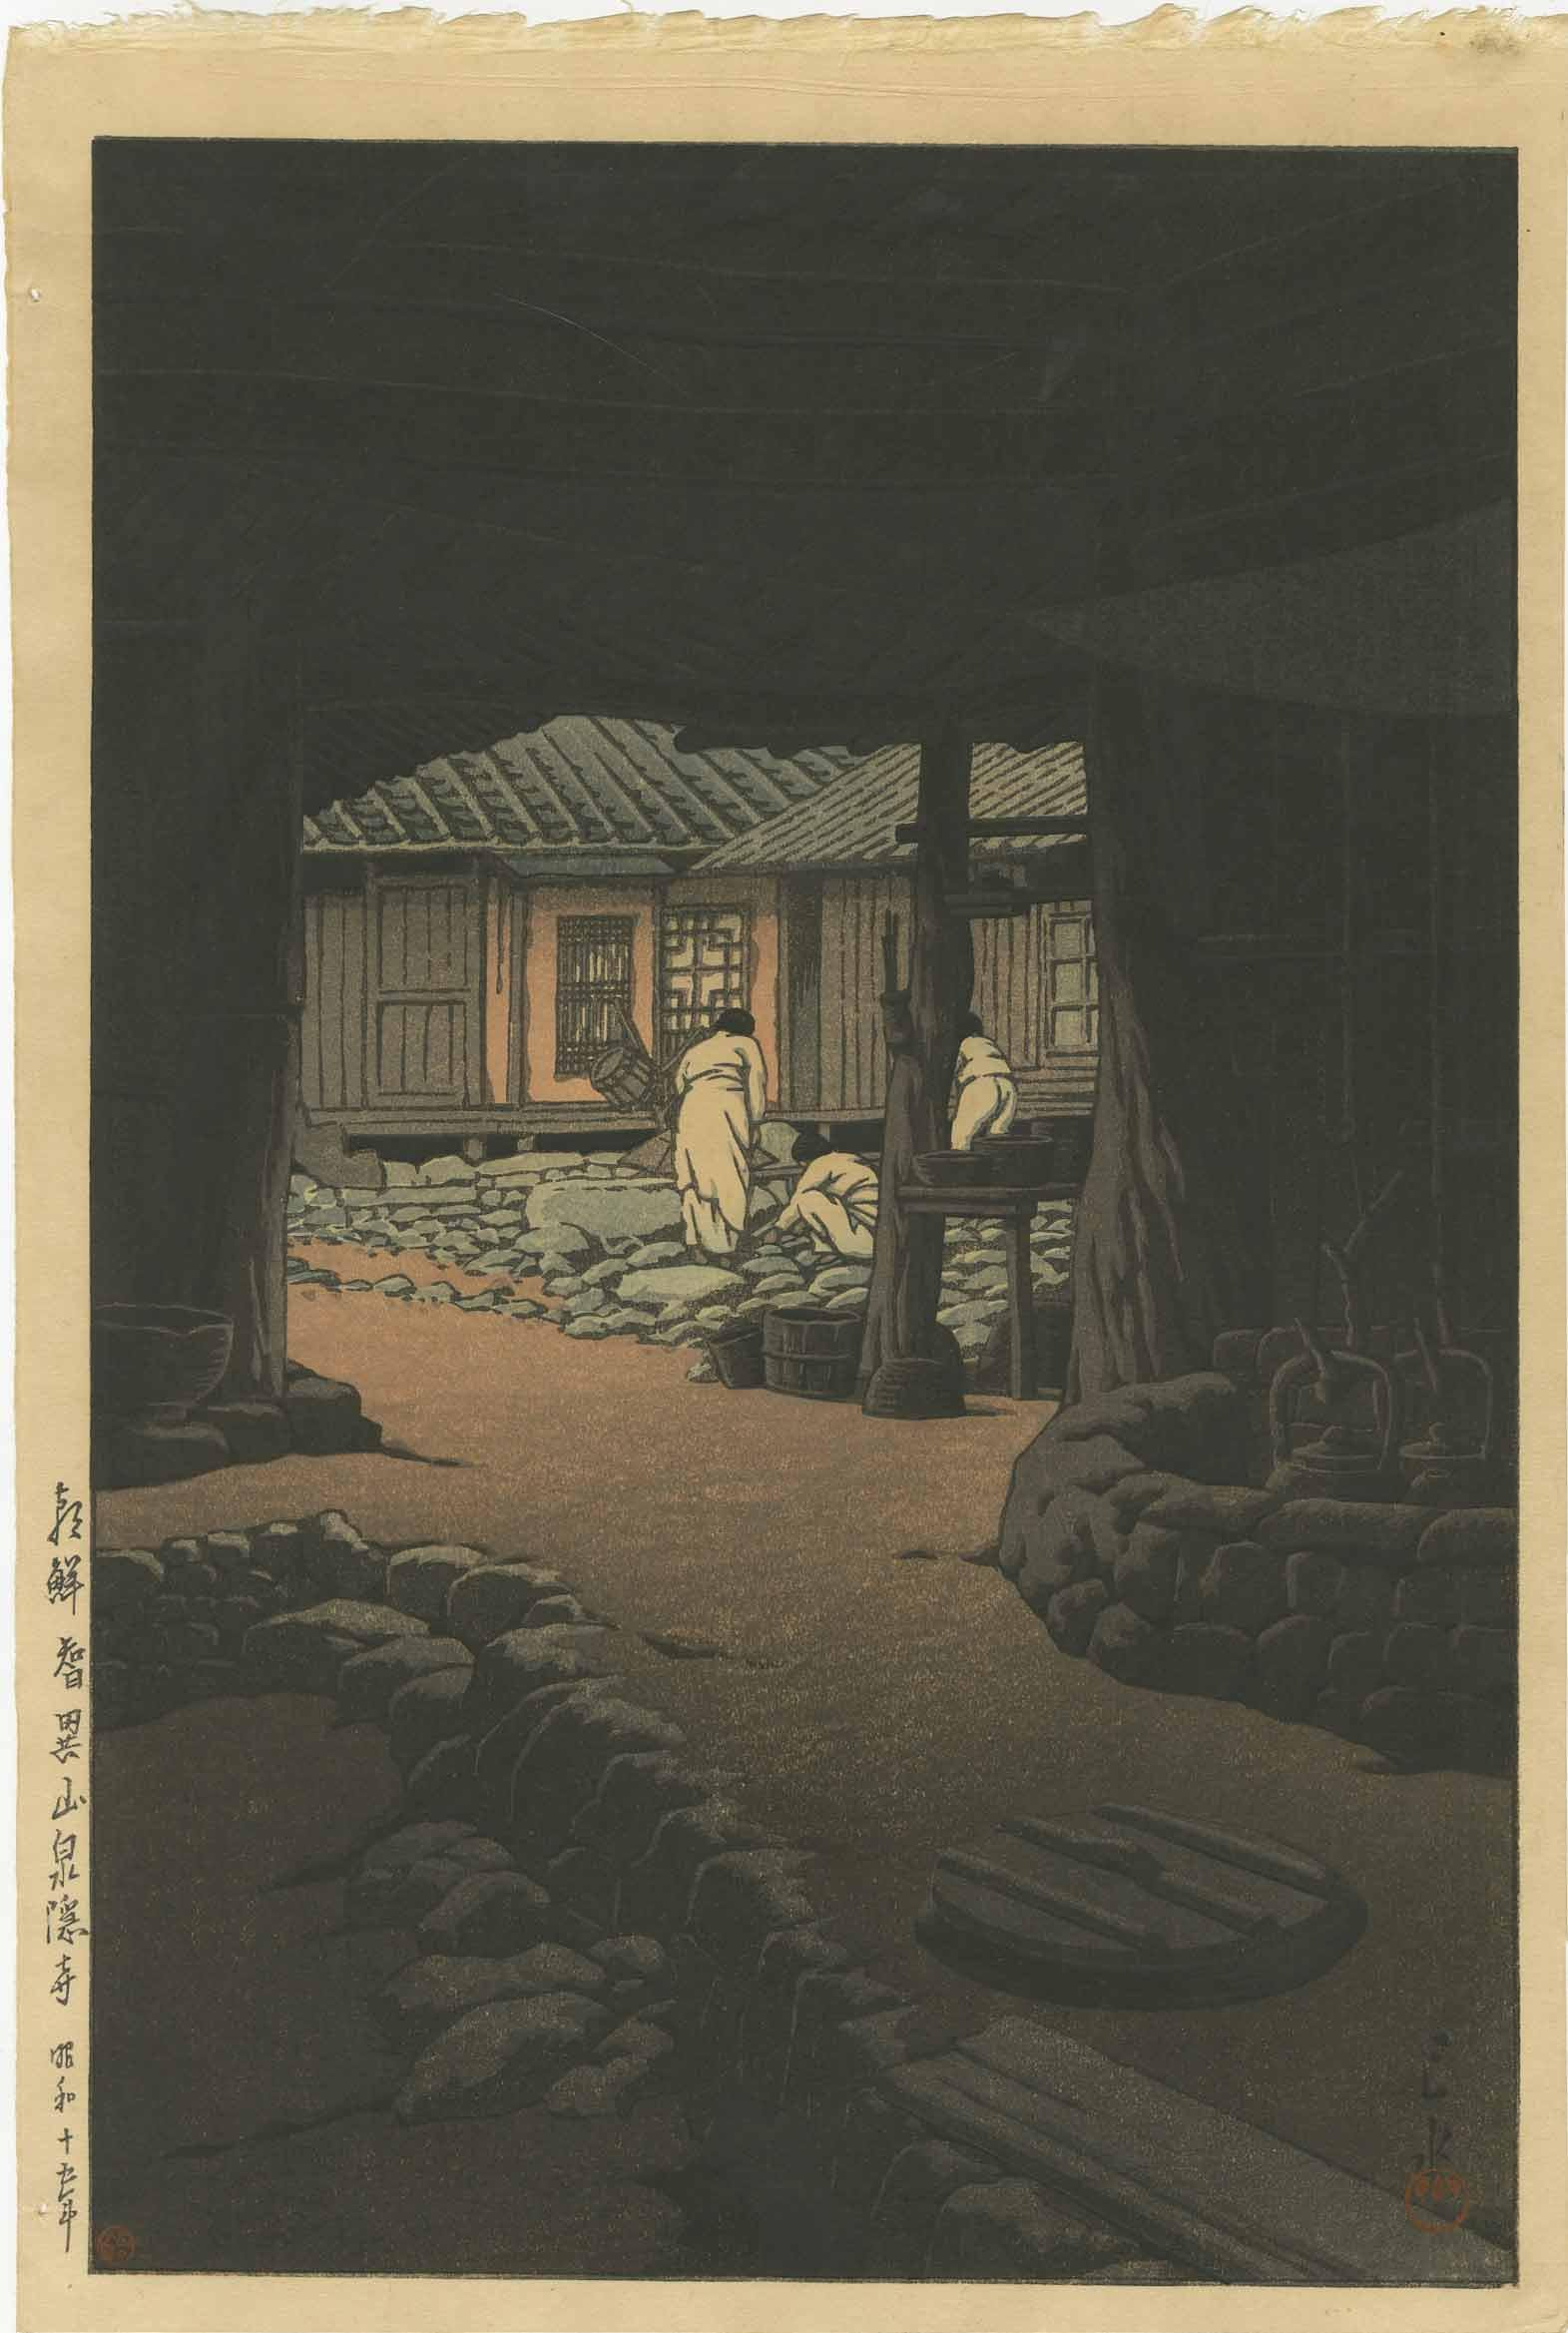 Kawase Hasui - Chunum Temple, Korea 1940 6-mm woodblock